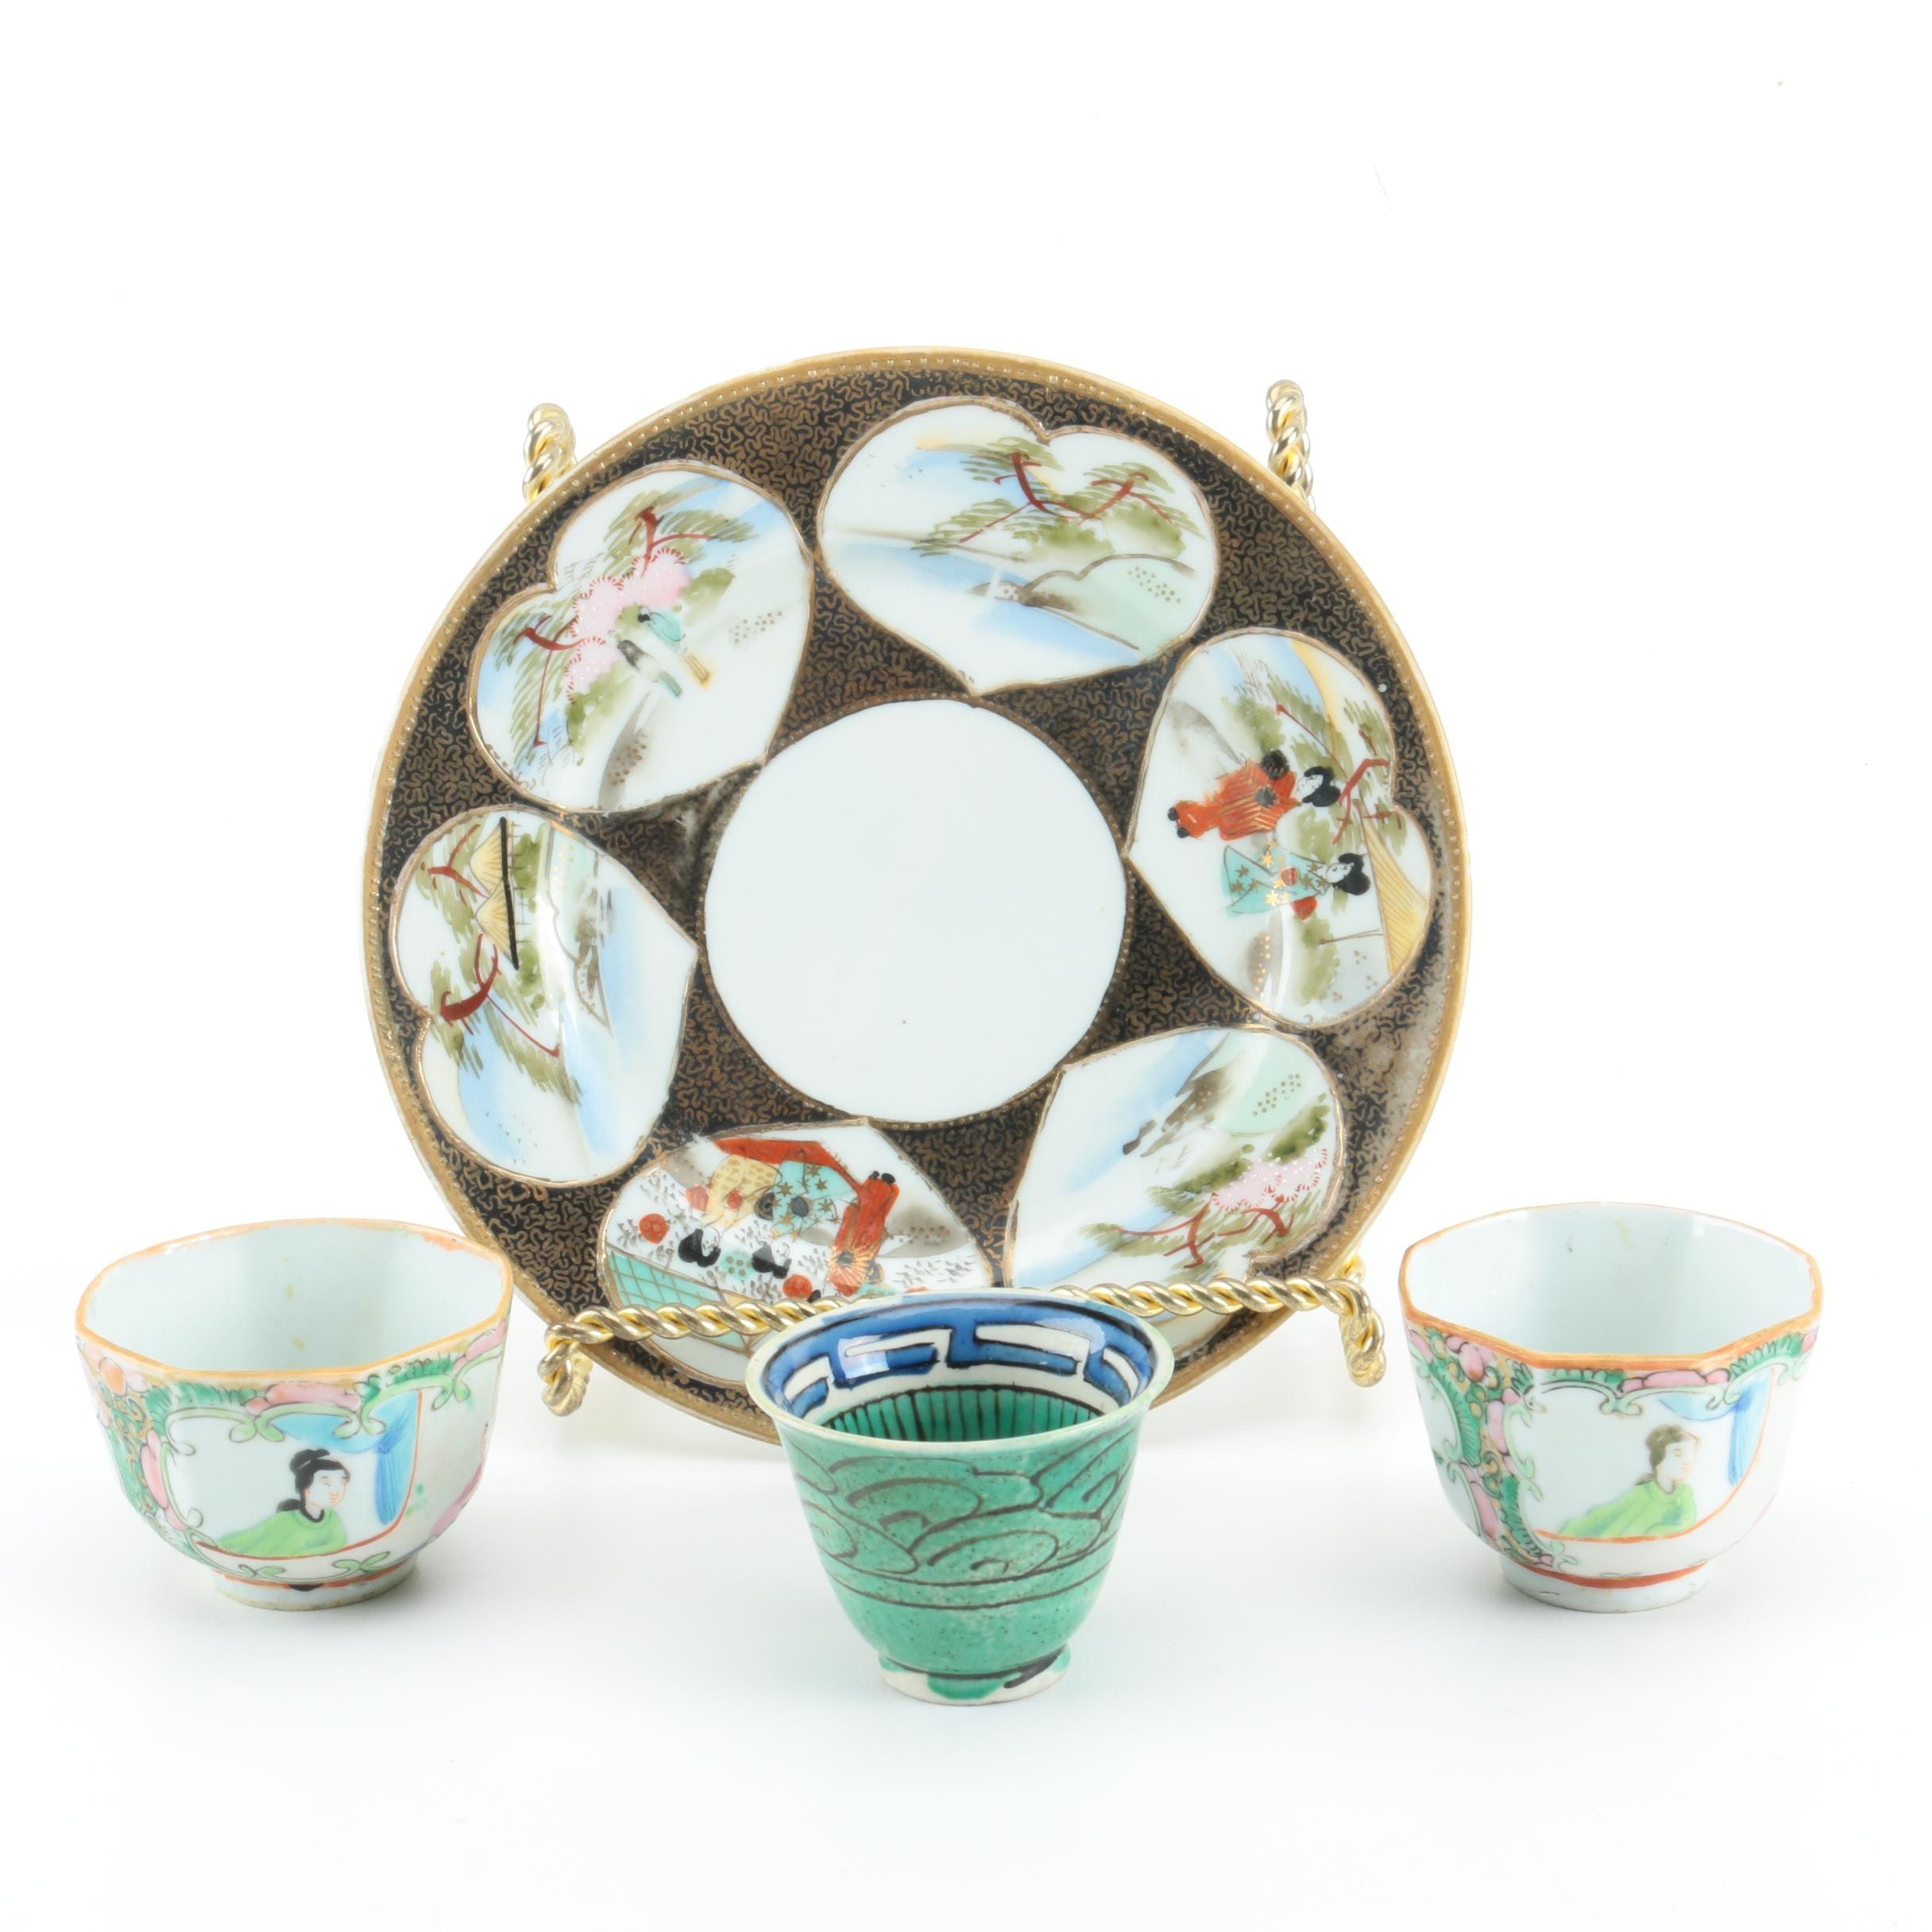 Vintage Tashiro Shoten Porcelain Plate and Kutani Stoneware Teacup